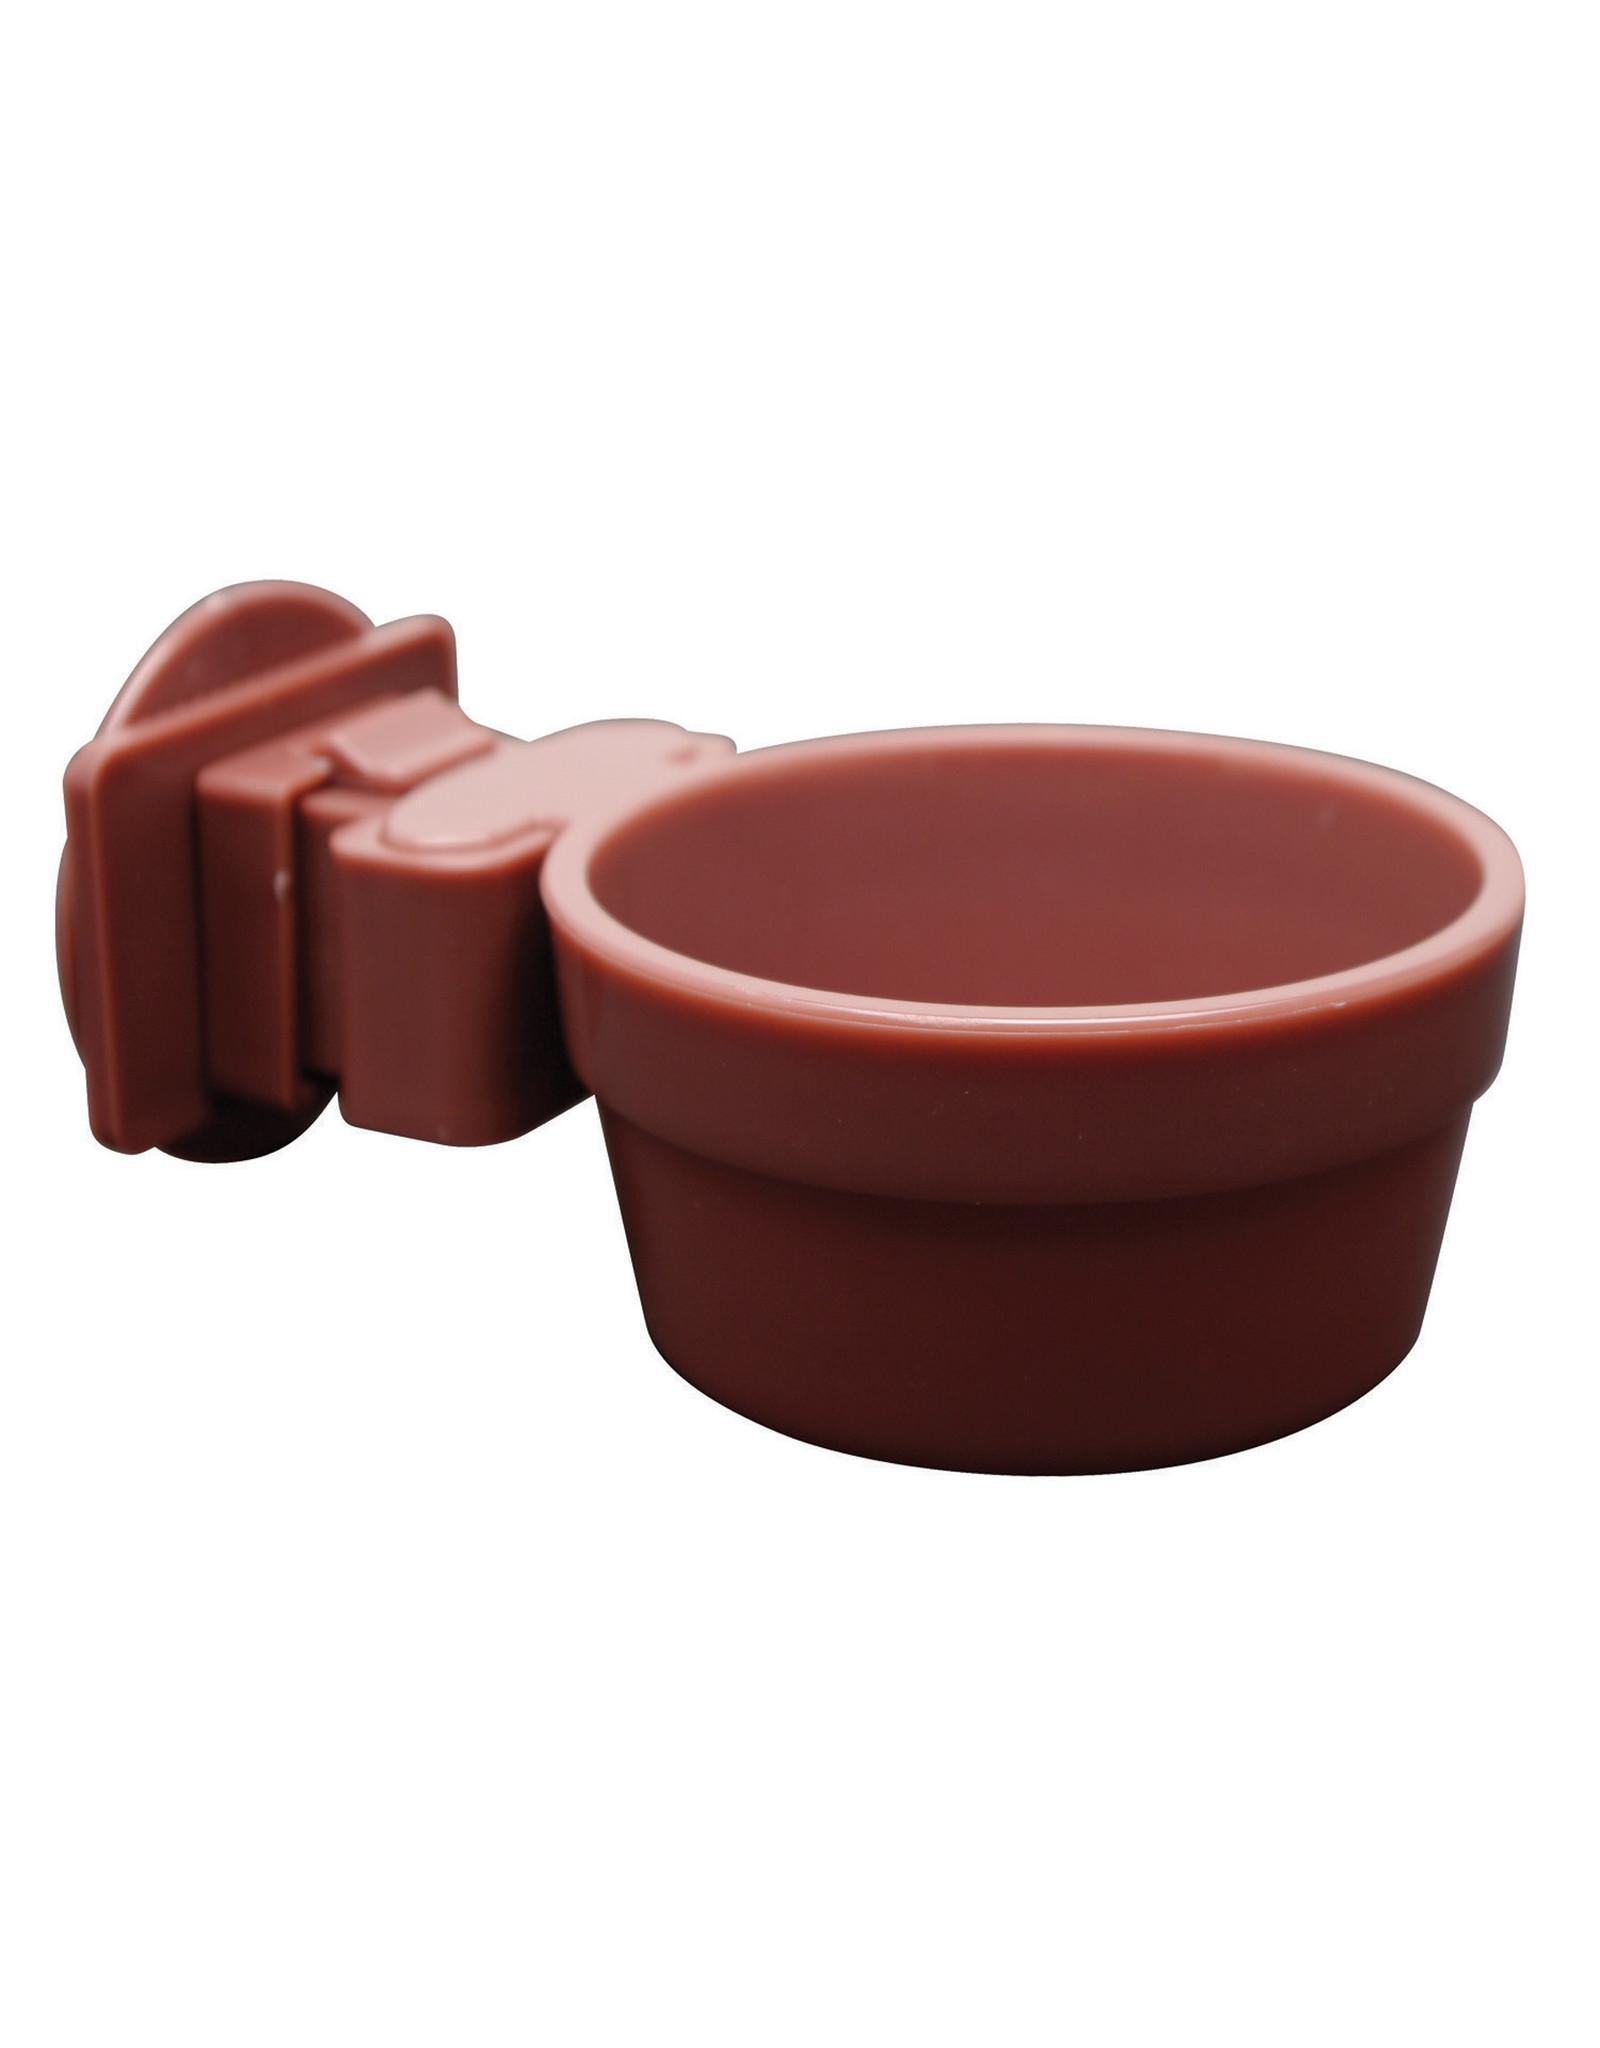 Living World Lock & Crock Dish - Burgundy Plum 177ml (6oz)